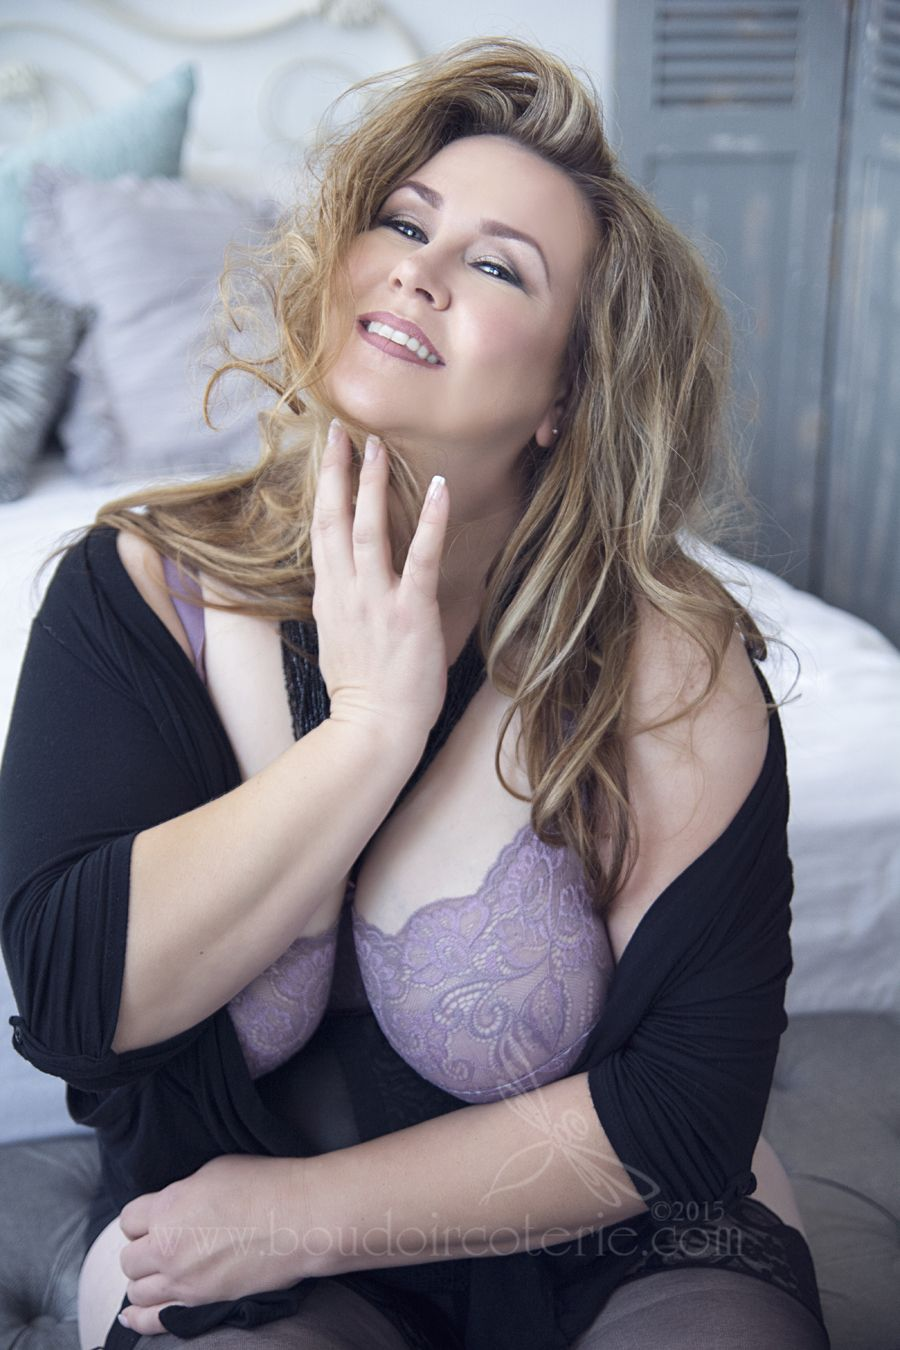 Full latina porn movies